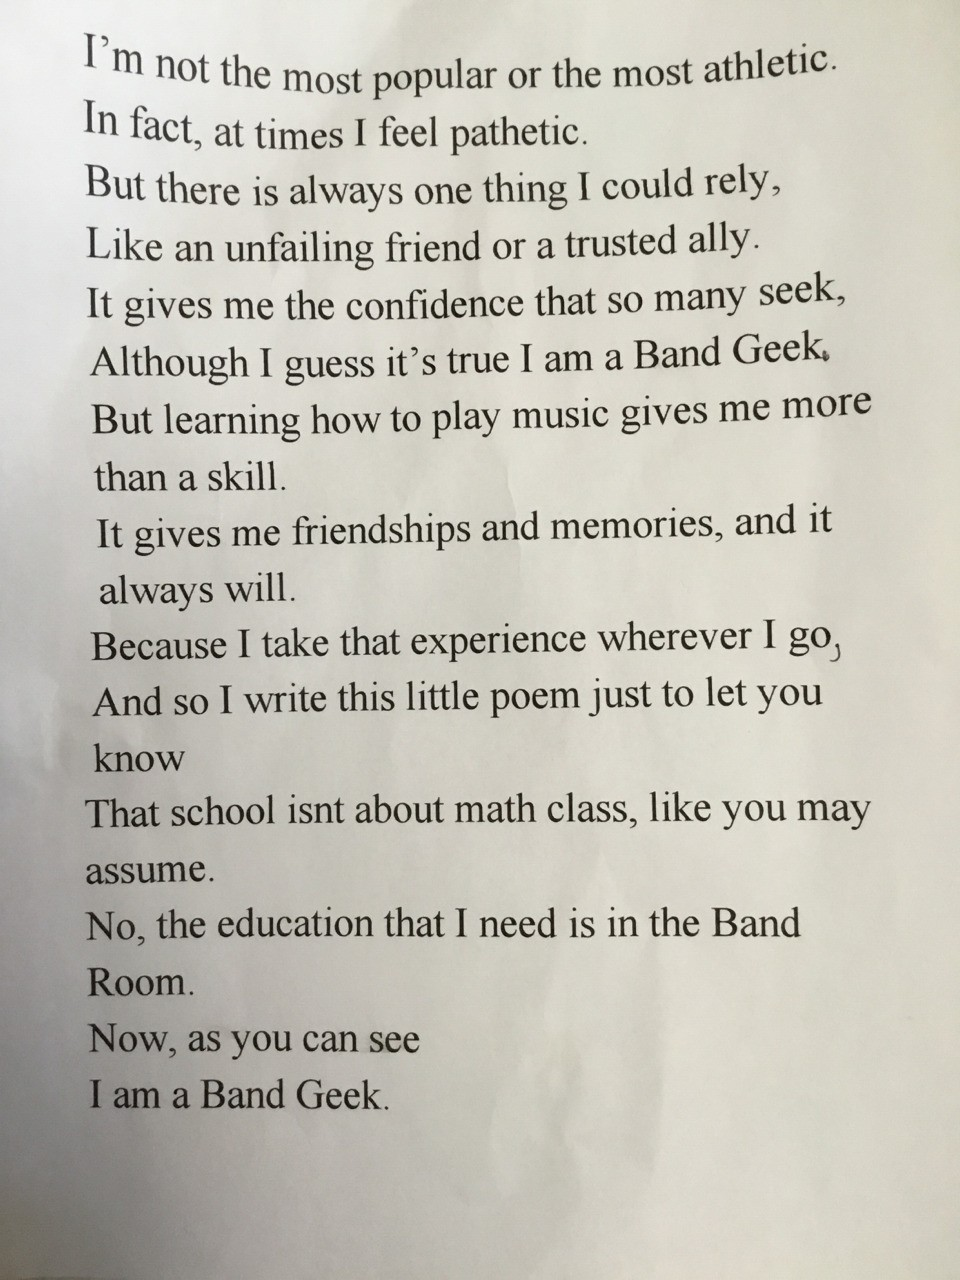 My creation (poem)